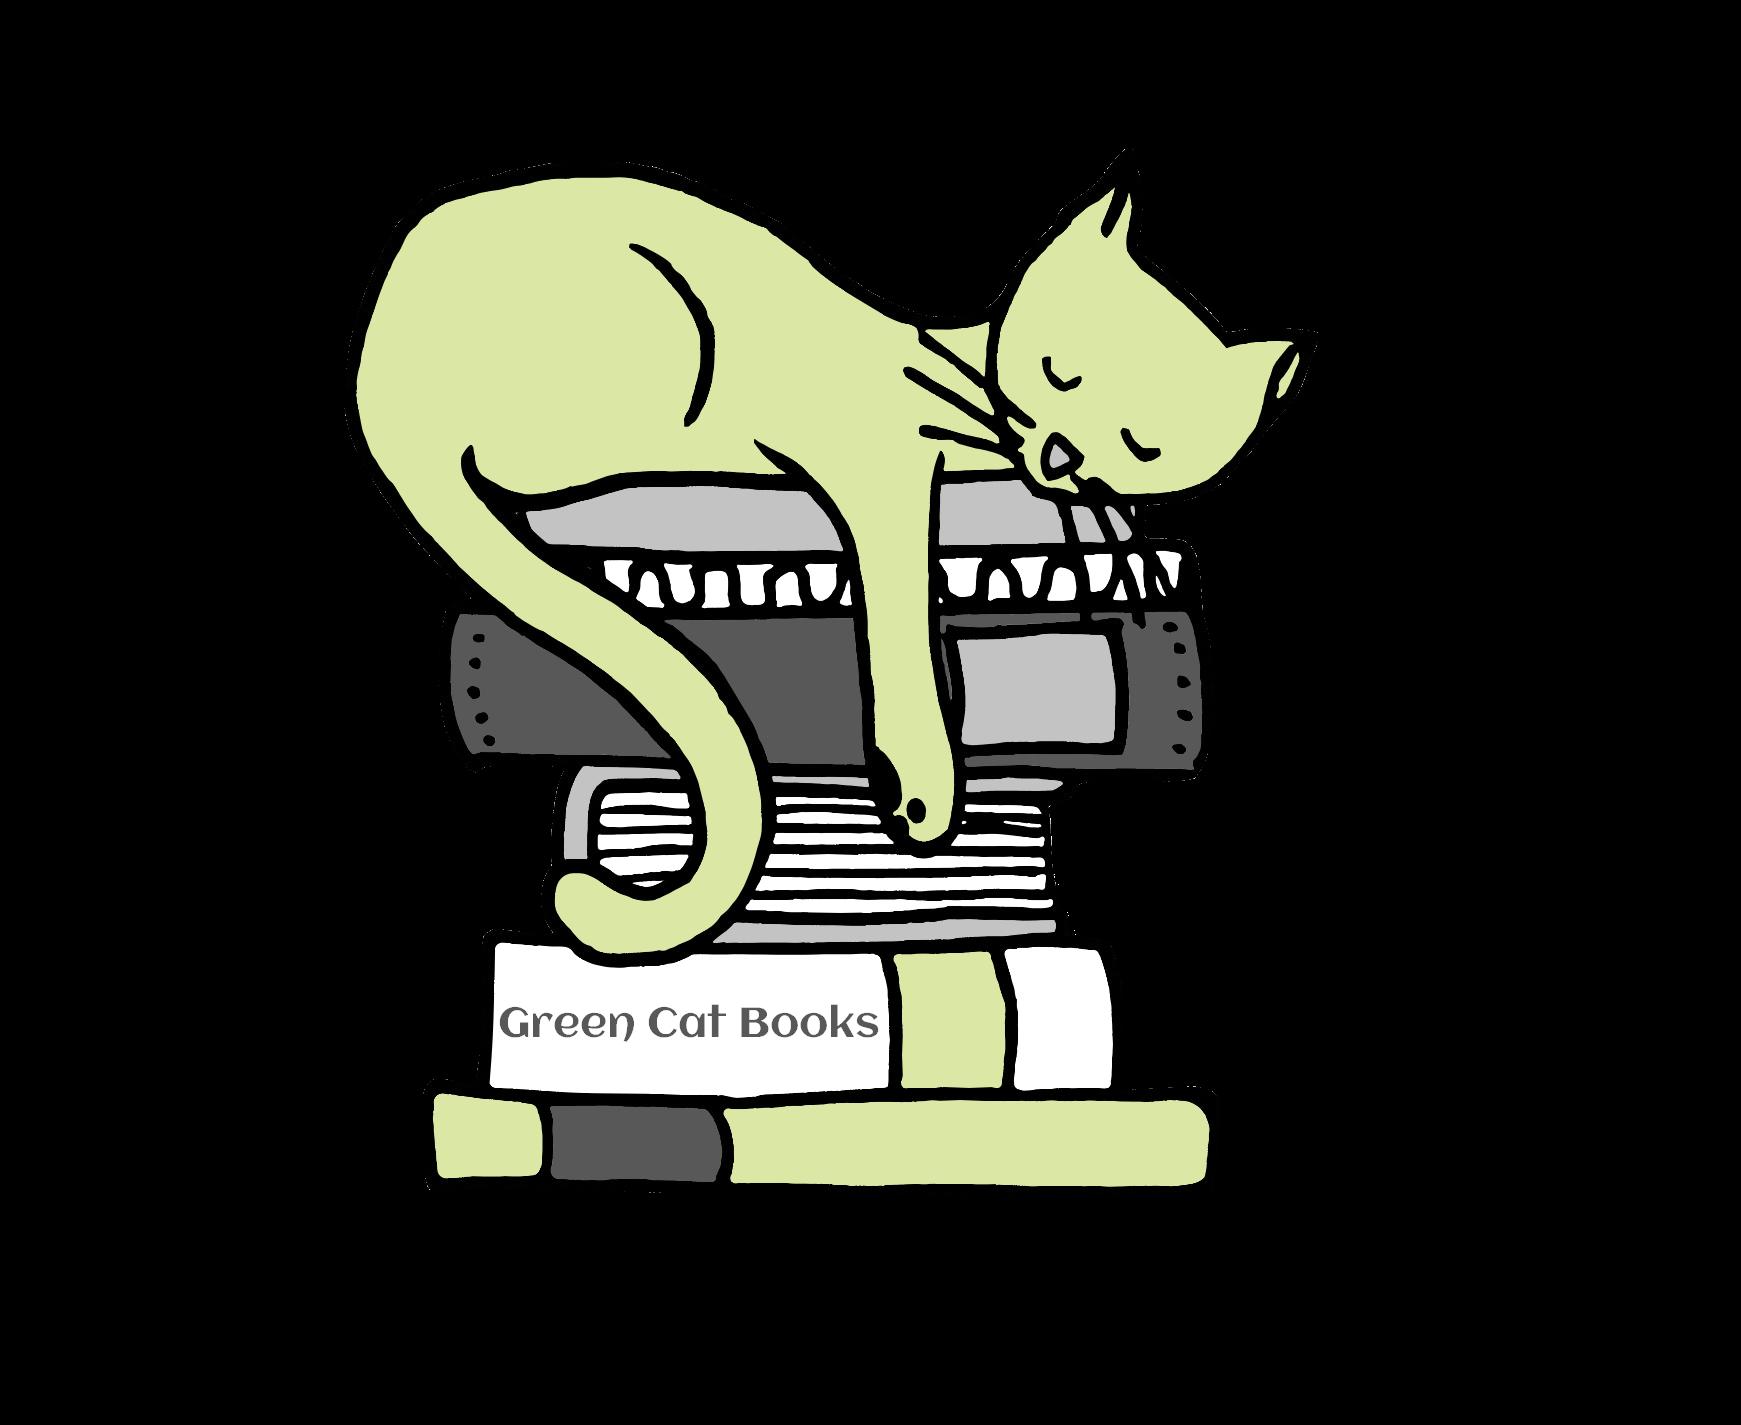 Green Cat Books logo